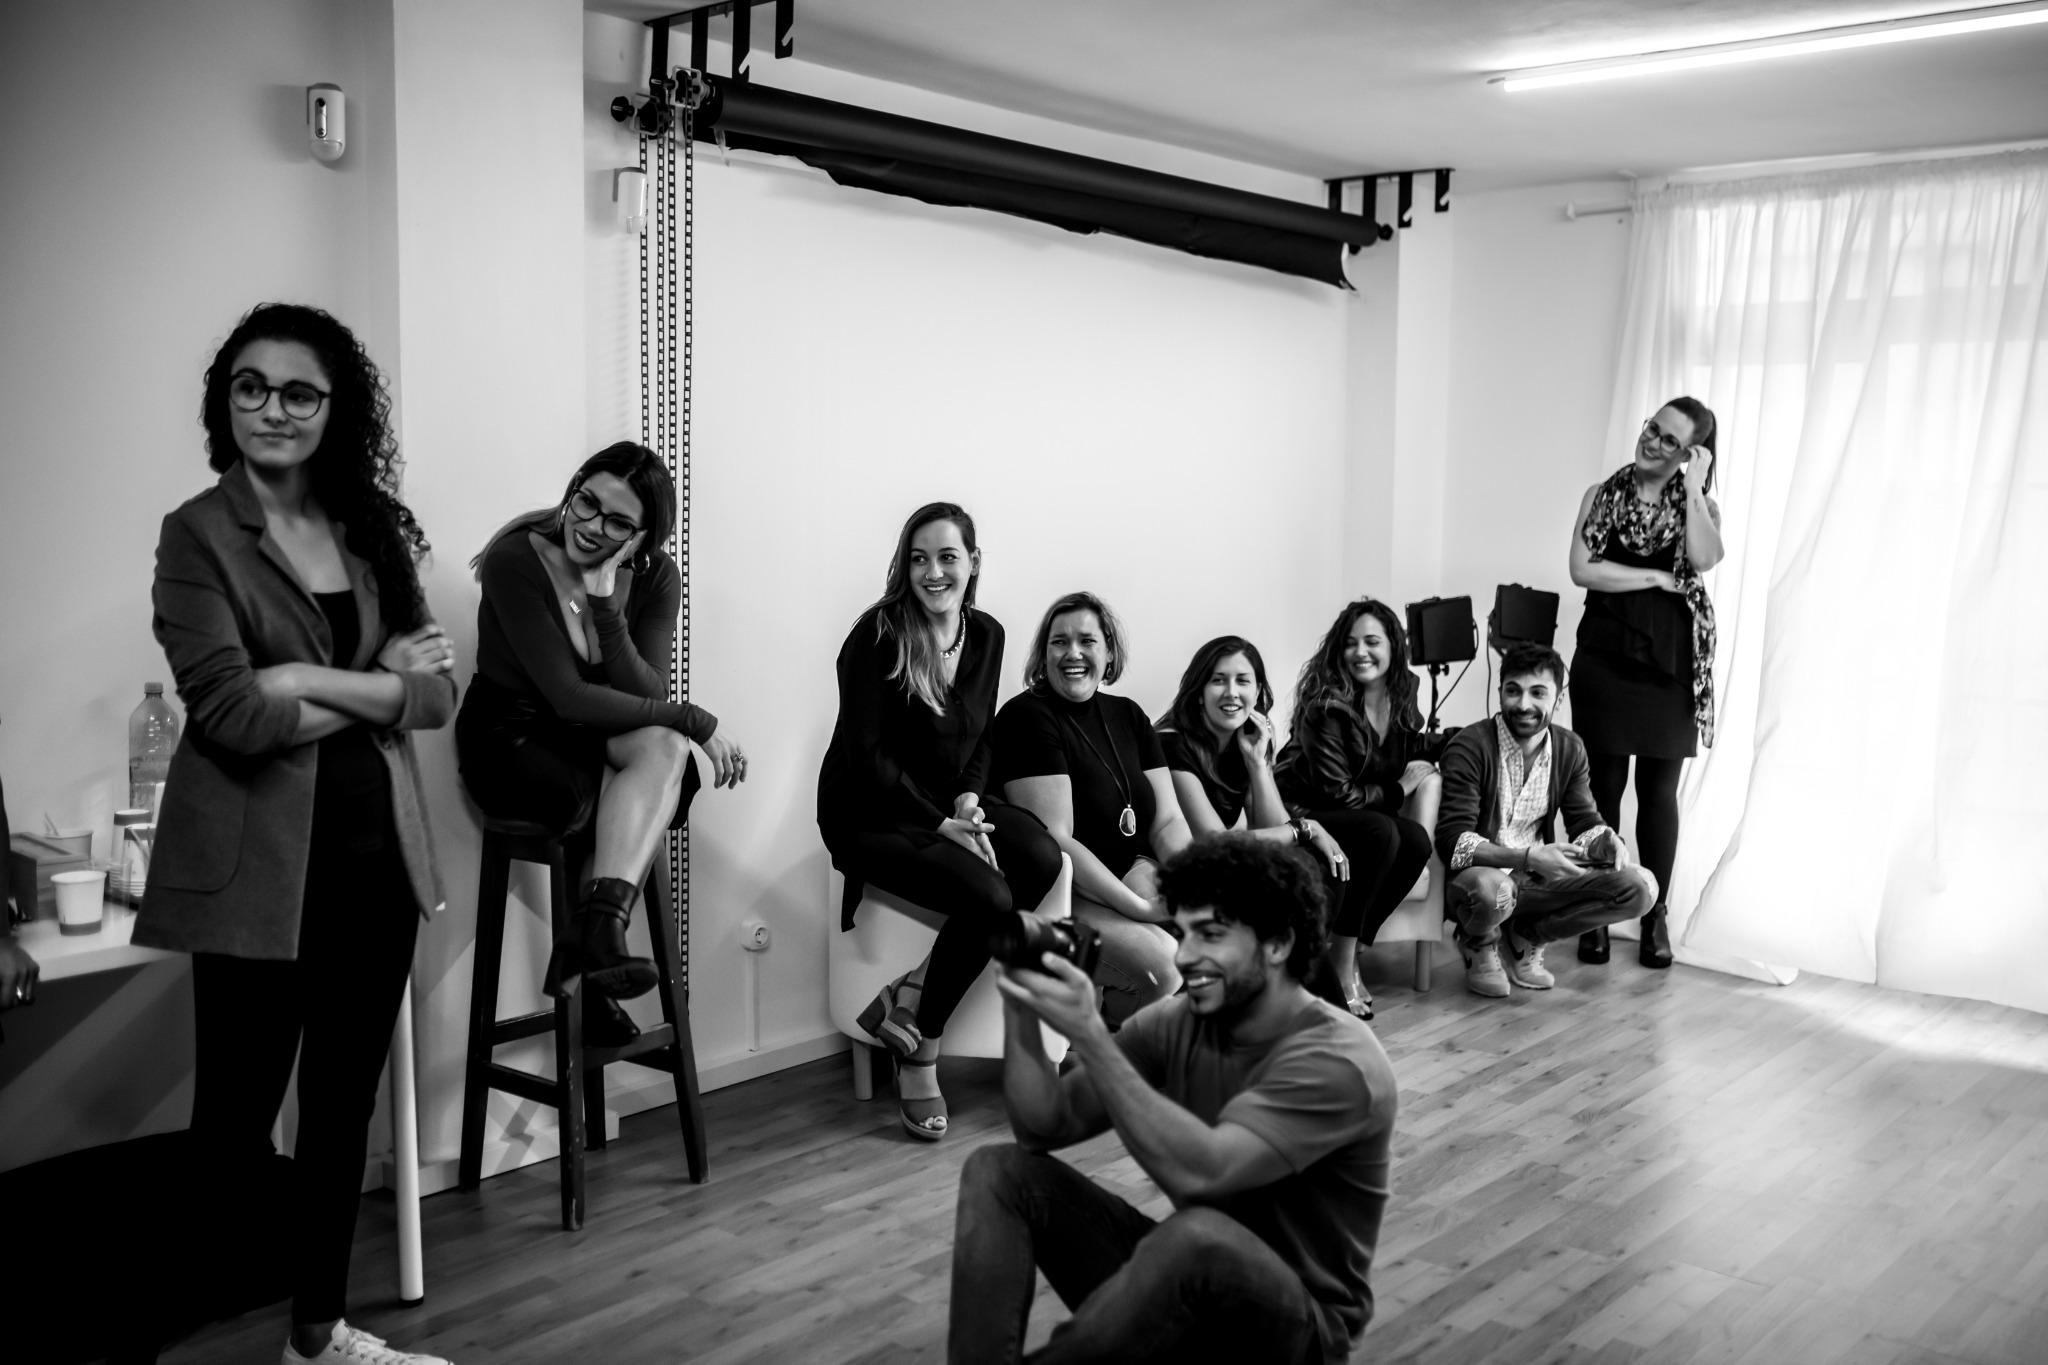 mujeres emprendedoras feliz de escuchar historia de empresa femenina